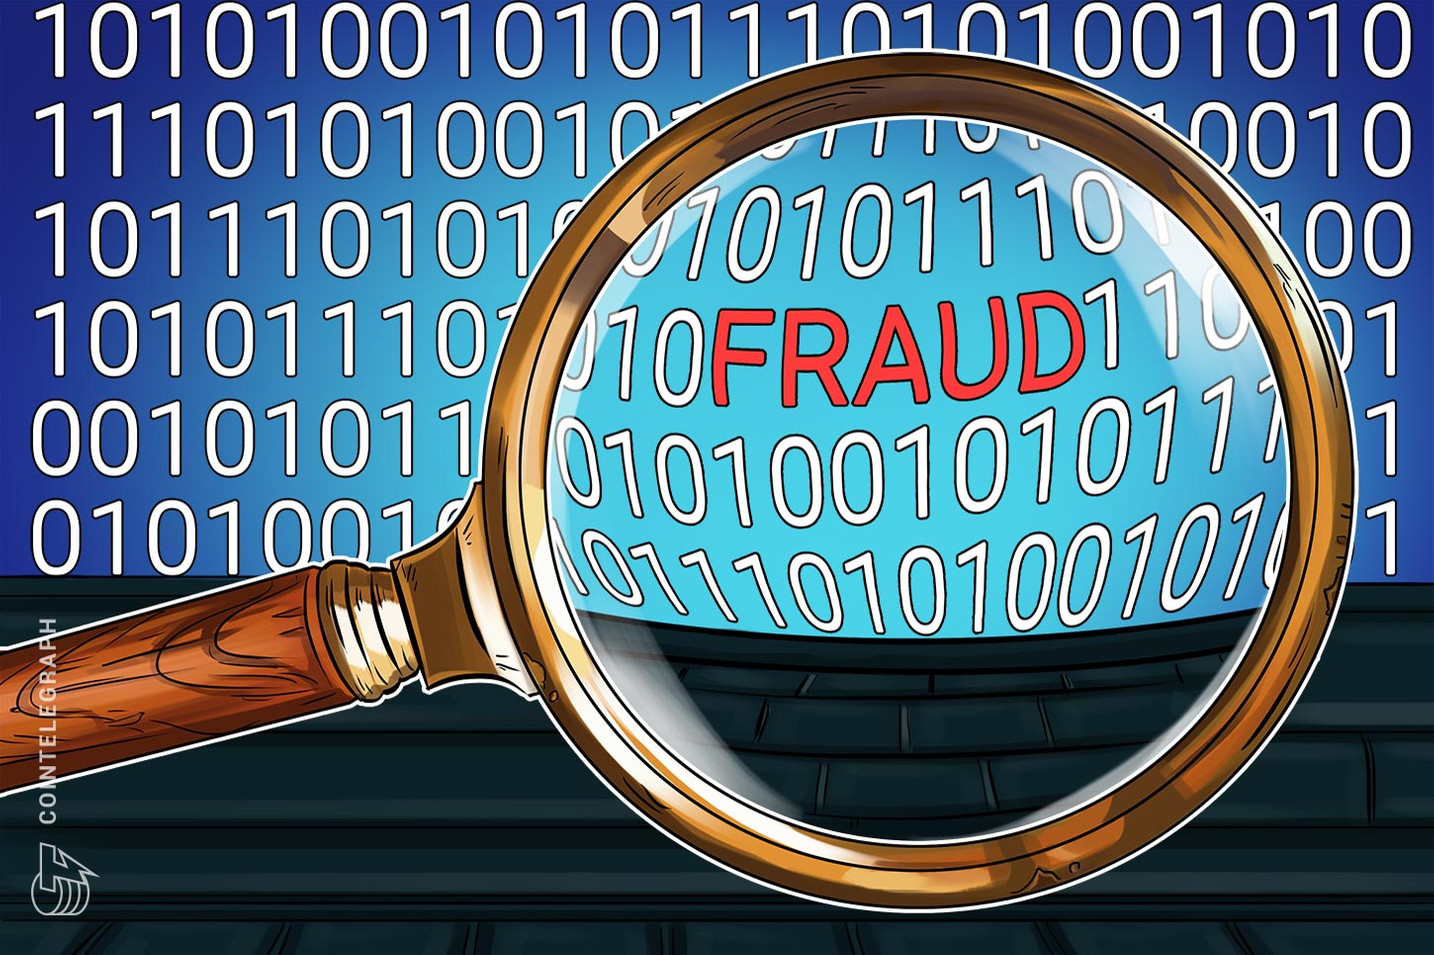 South African Police Investigate Alleged Crypto Ponzi-Scheme Involving 28,000 Investors